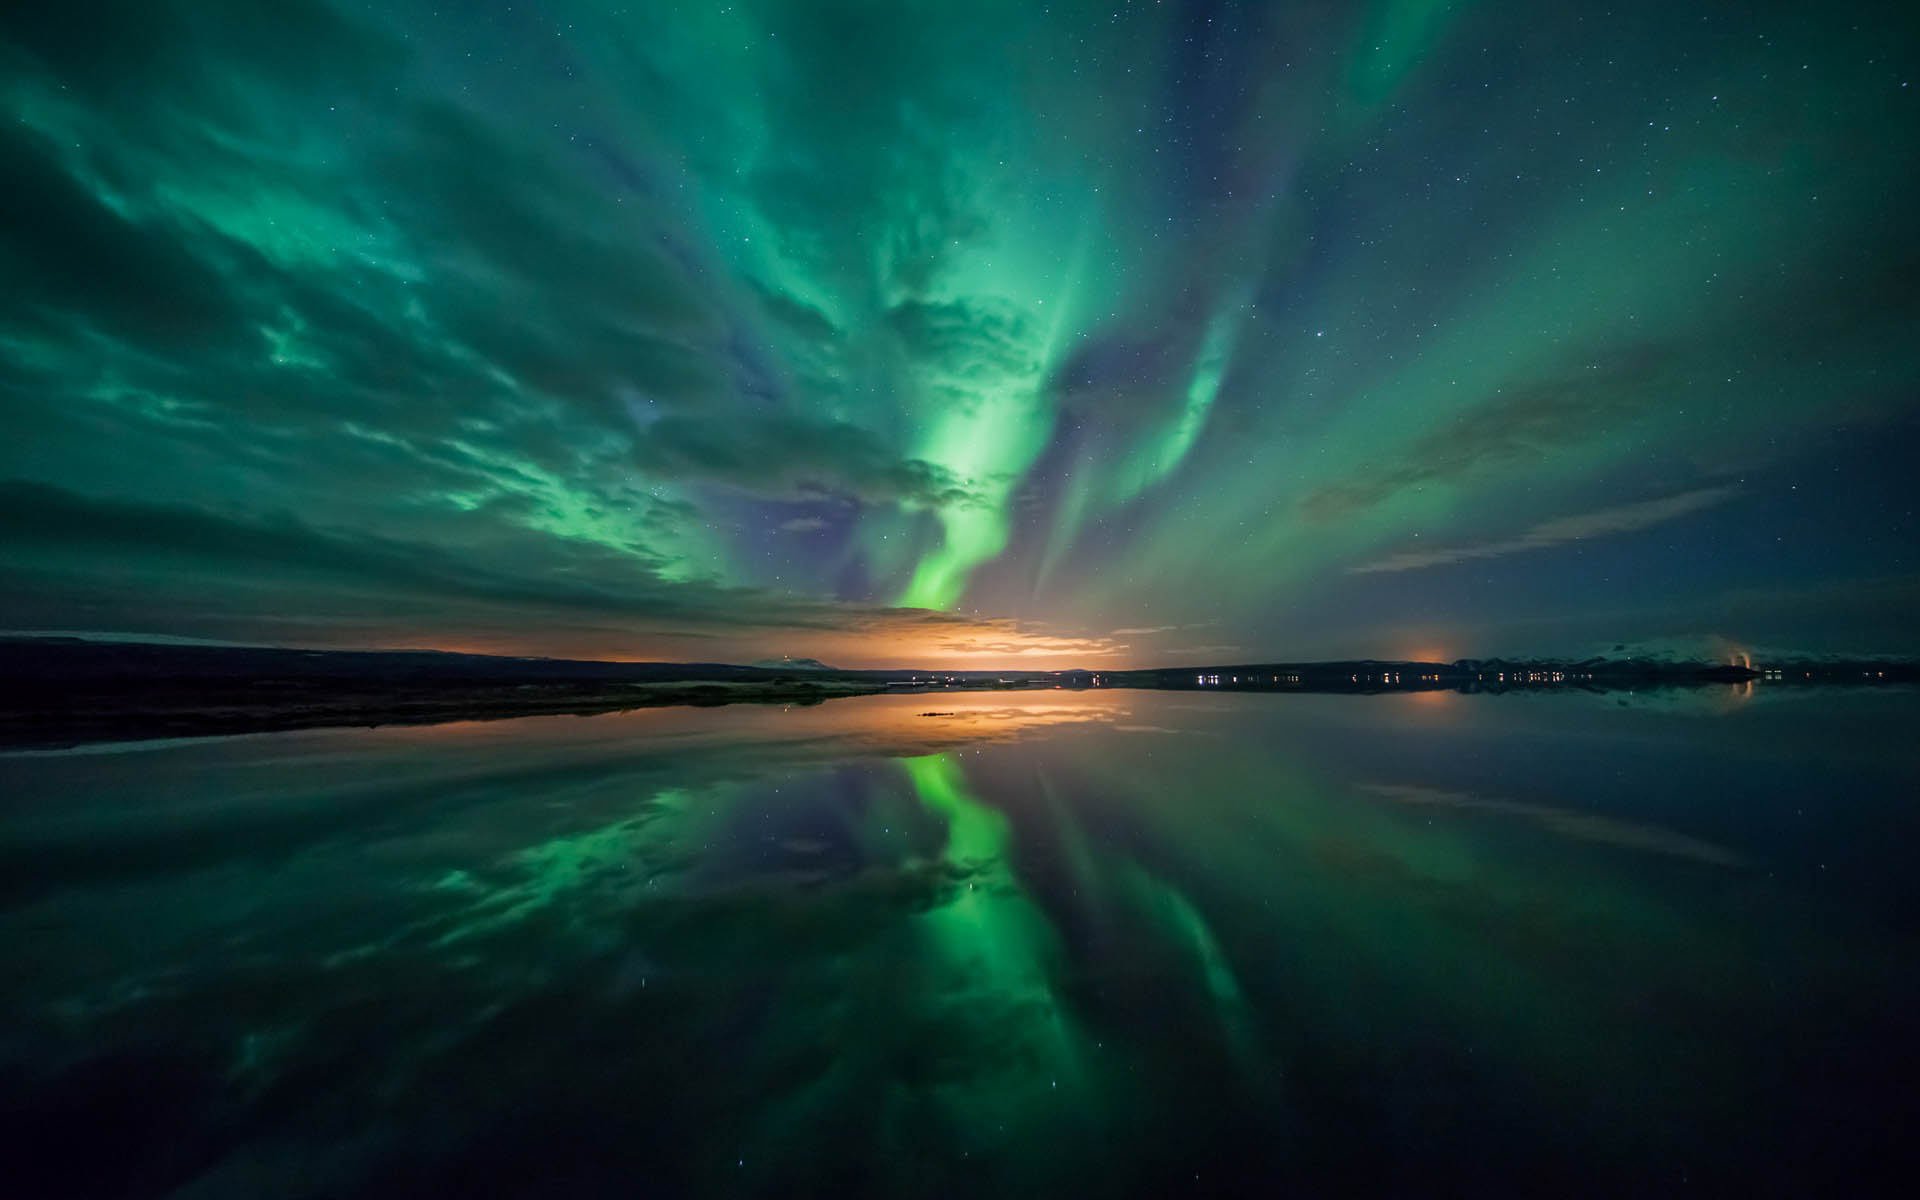 Aurora Borealis High Definition HD Wallpapers 2015 - All ...